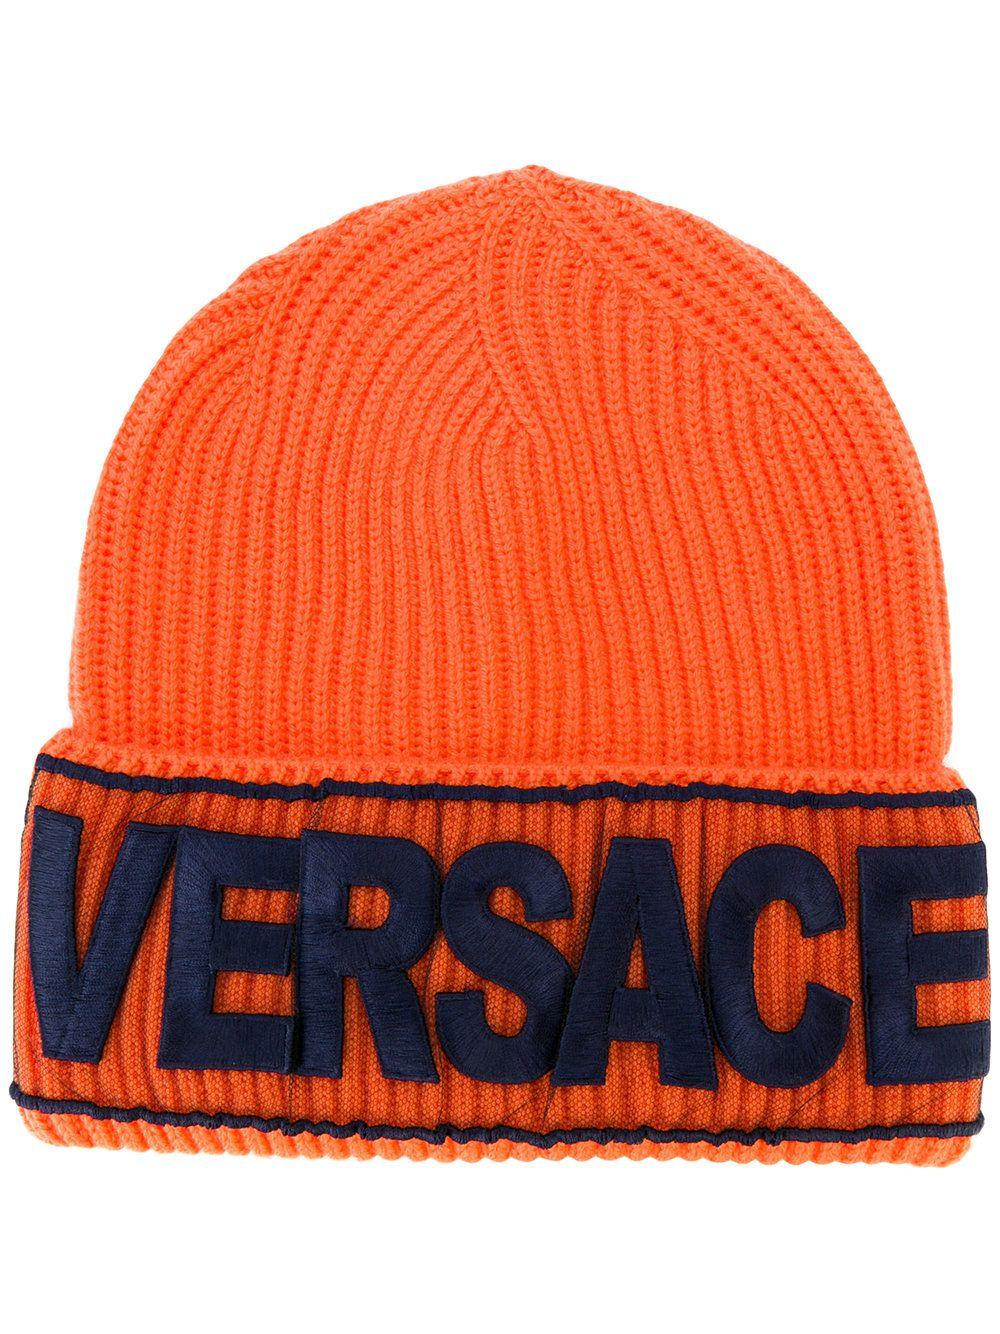 5a8befc30 Versace Logo manifesto beanie   Pakaian in 2019   Versace logo ...